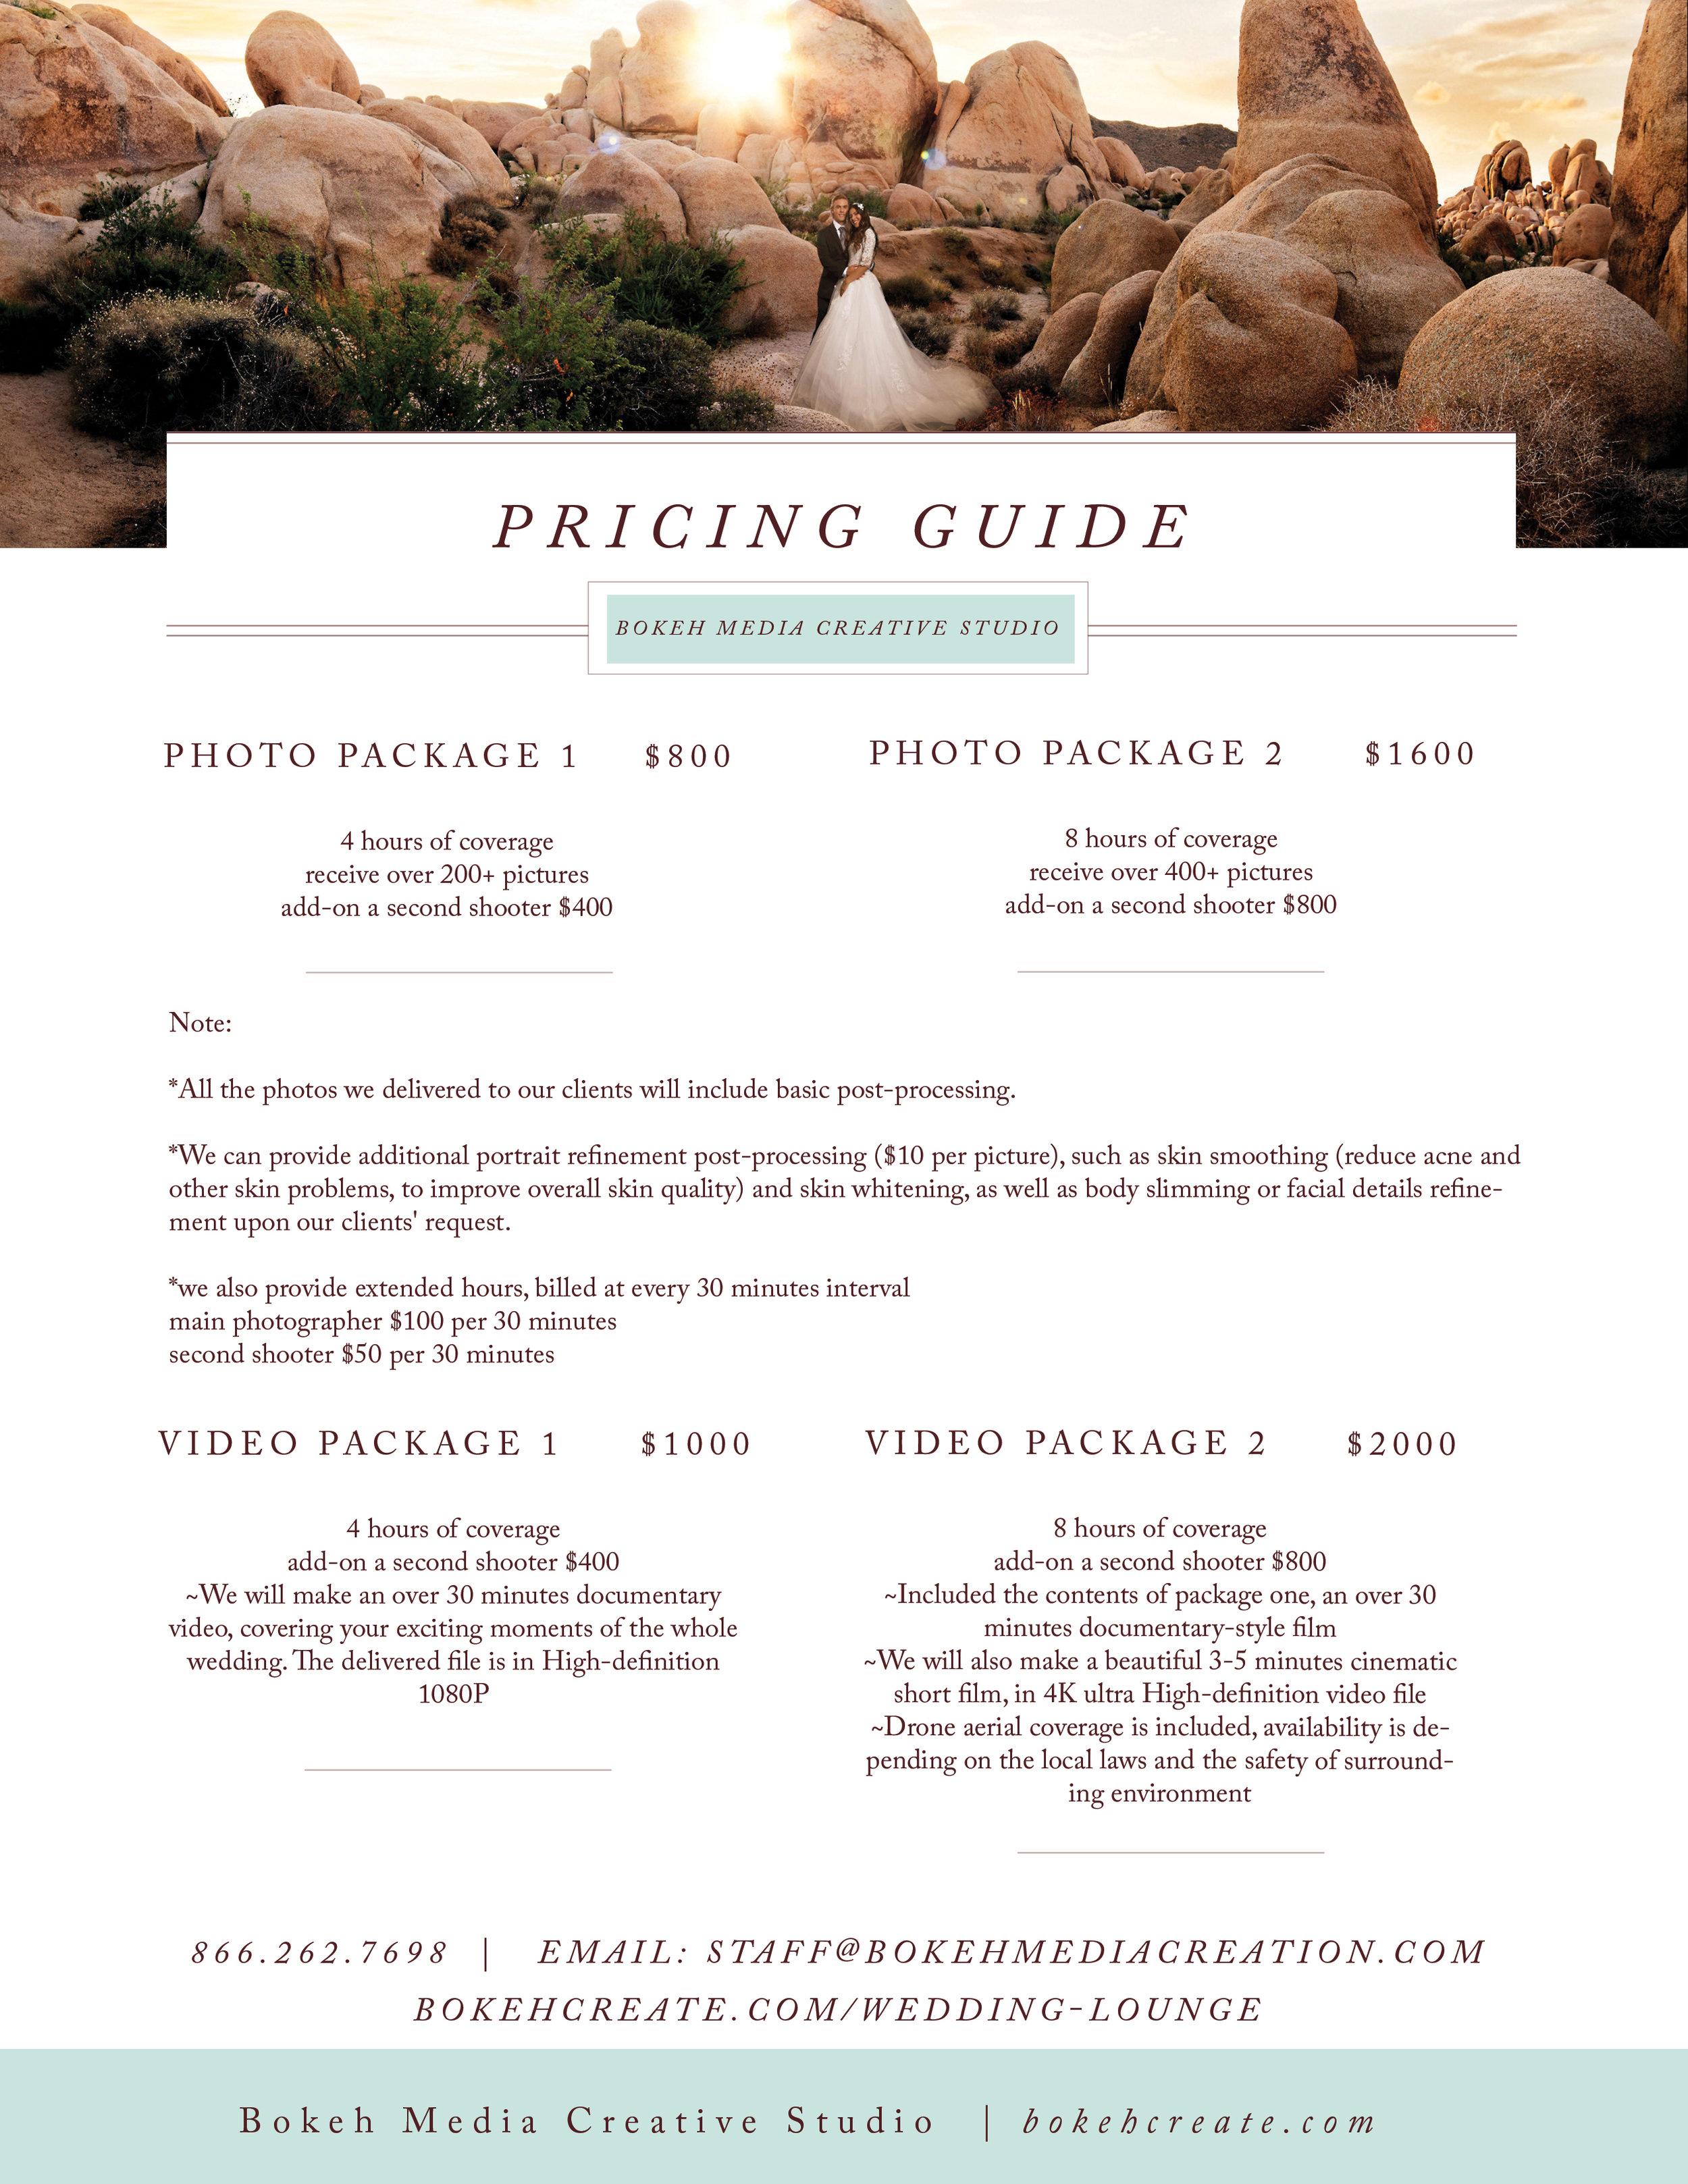 Bokeh Media Wedding Pricing Guide.jpg